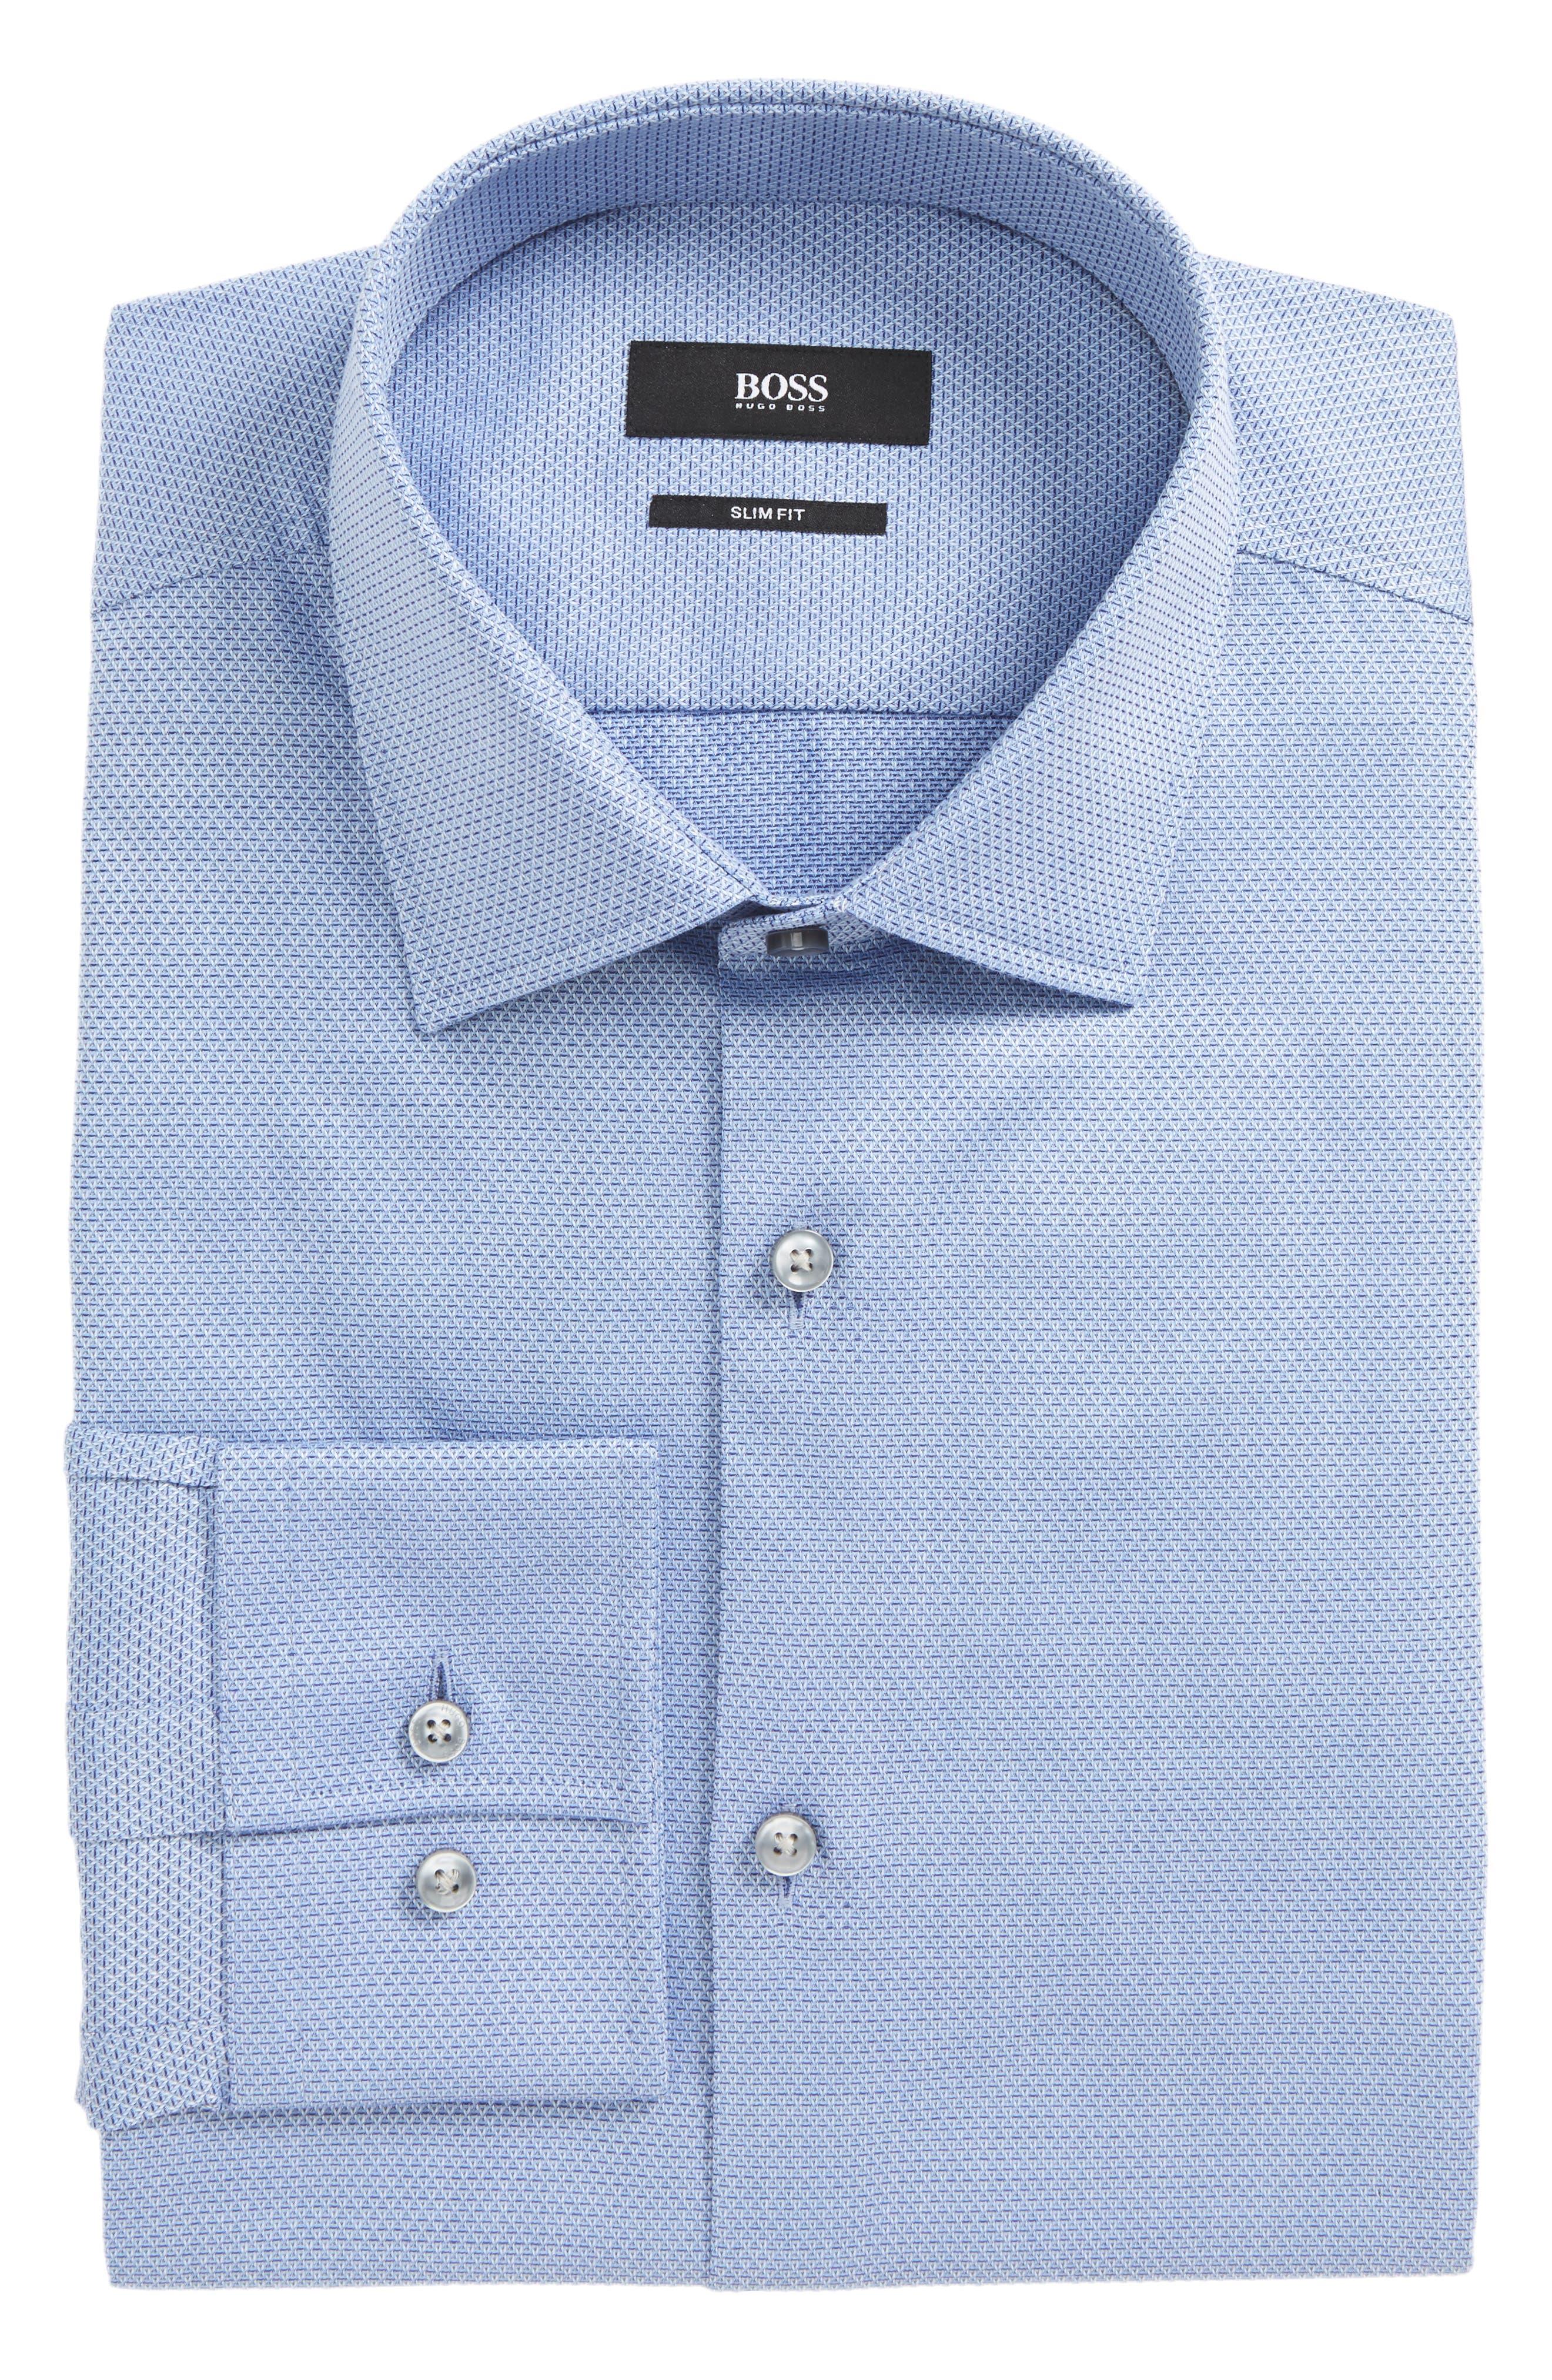 BOSS Jenno Slim Fit Textured Dress Shirt